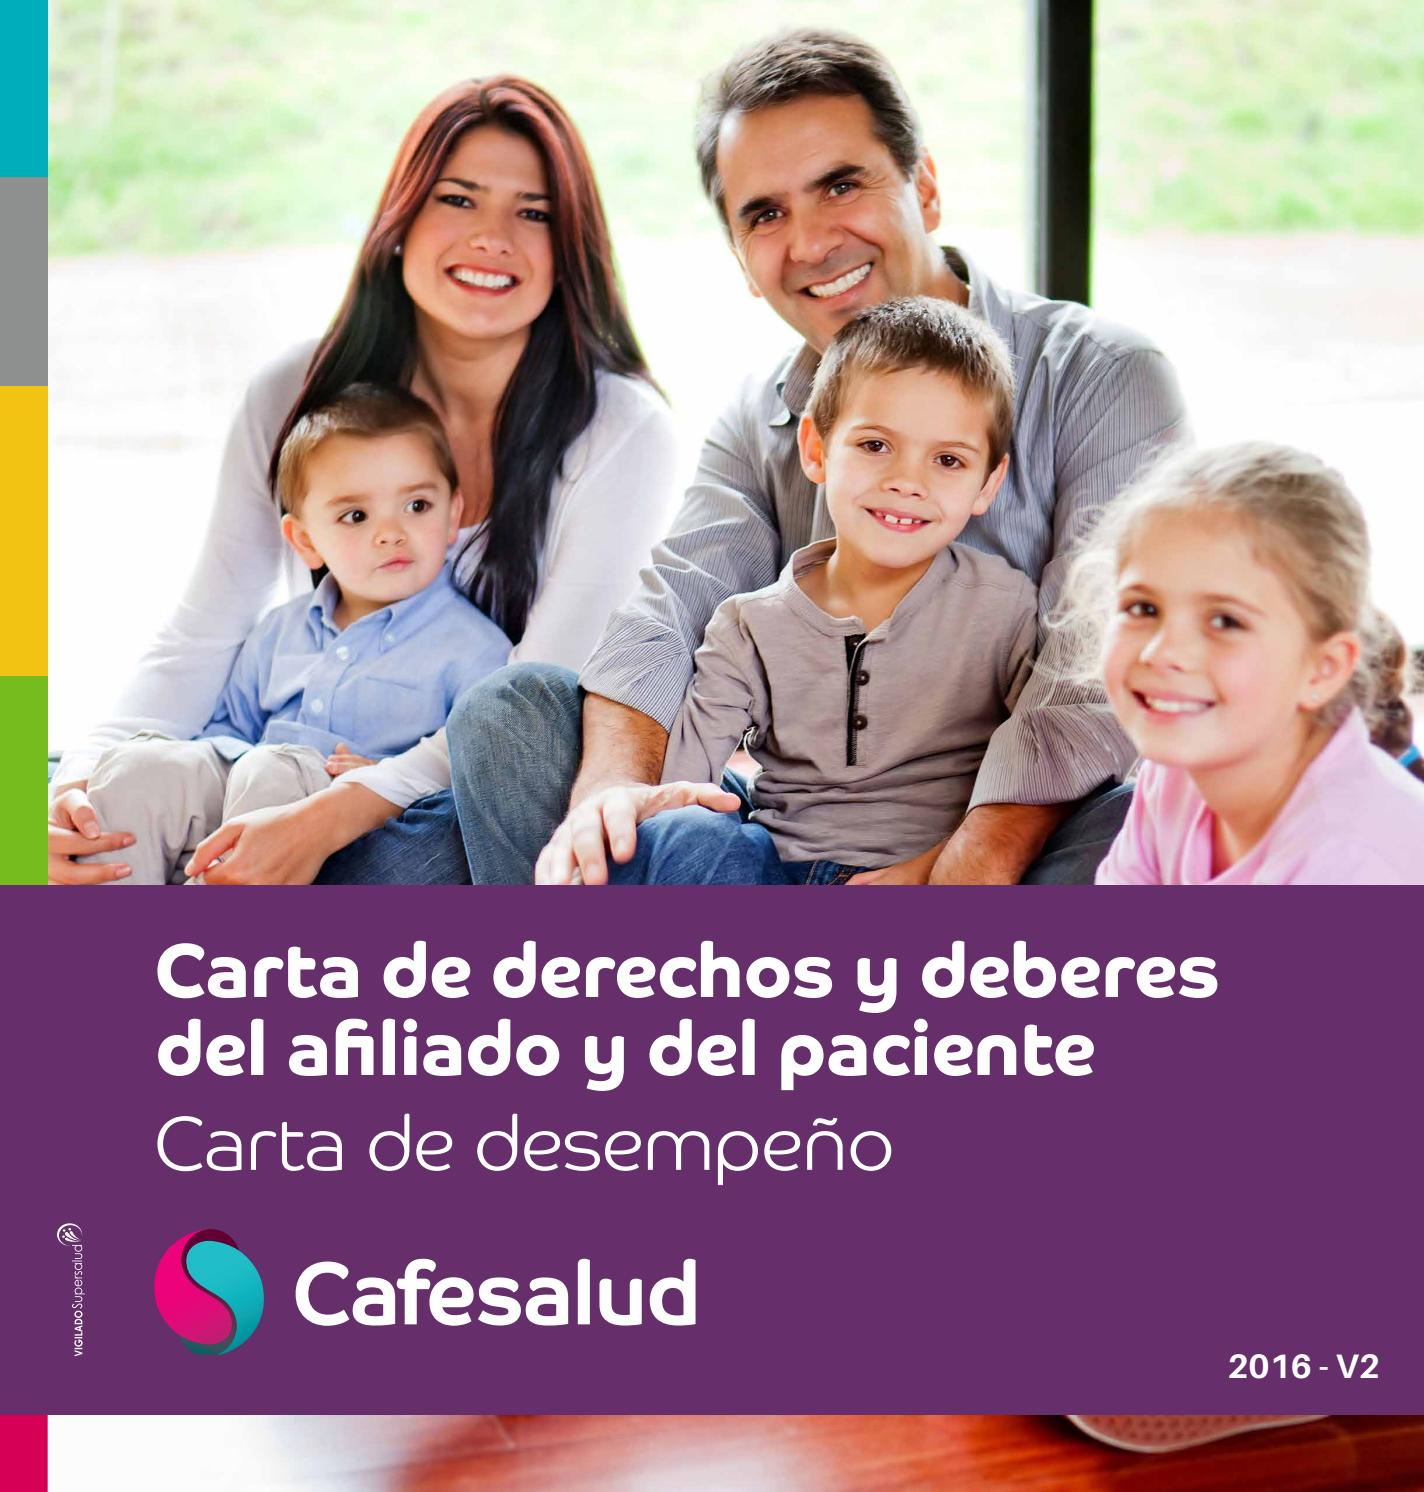 Cafesalud Eps Citas - 230612